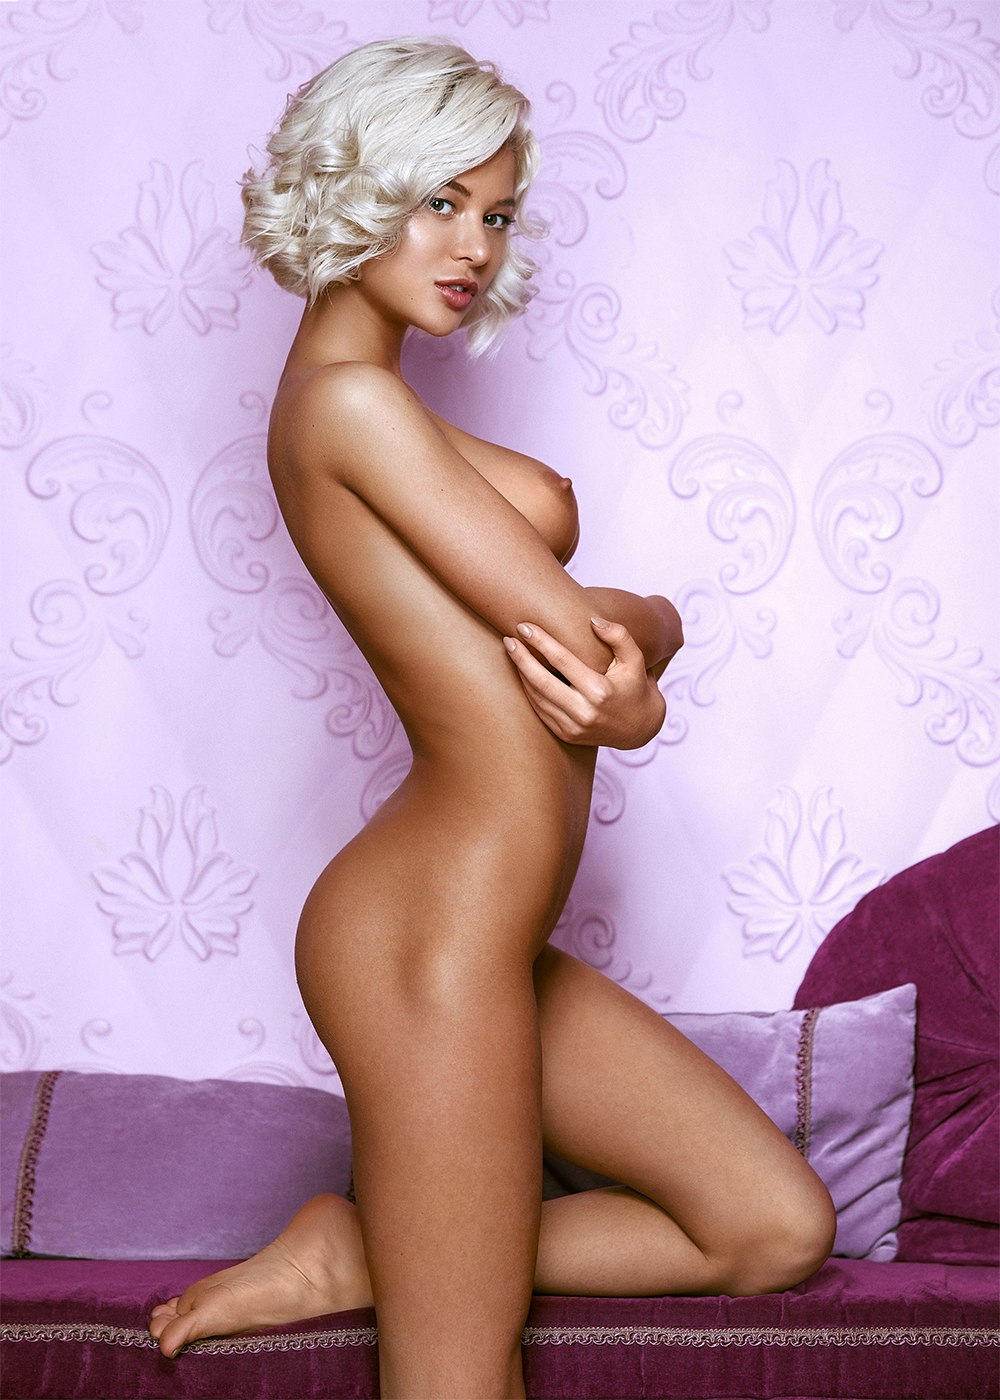 XXX Evgeniya Podberezkina naked (39 foto and video), Tits, Sideboobs, Twitter, in bikini 2015